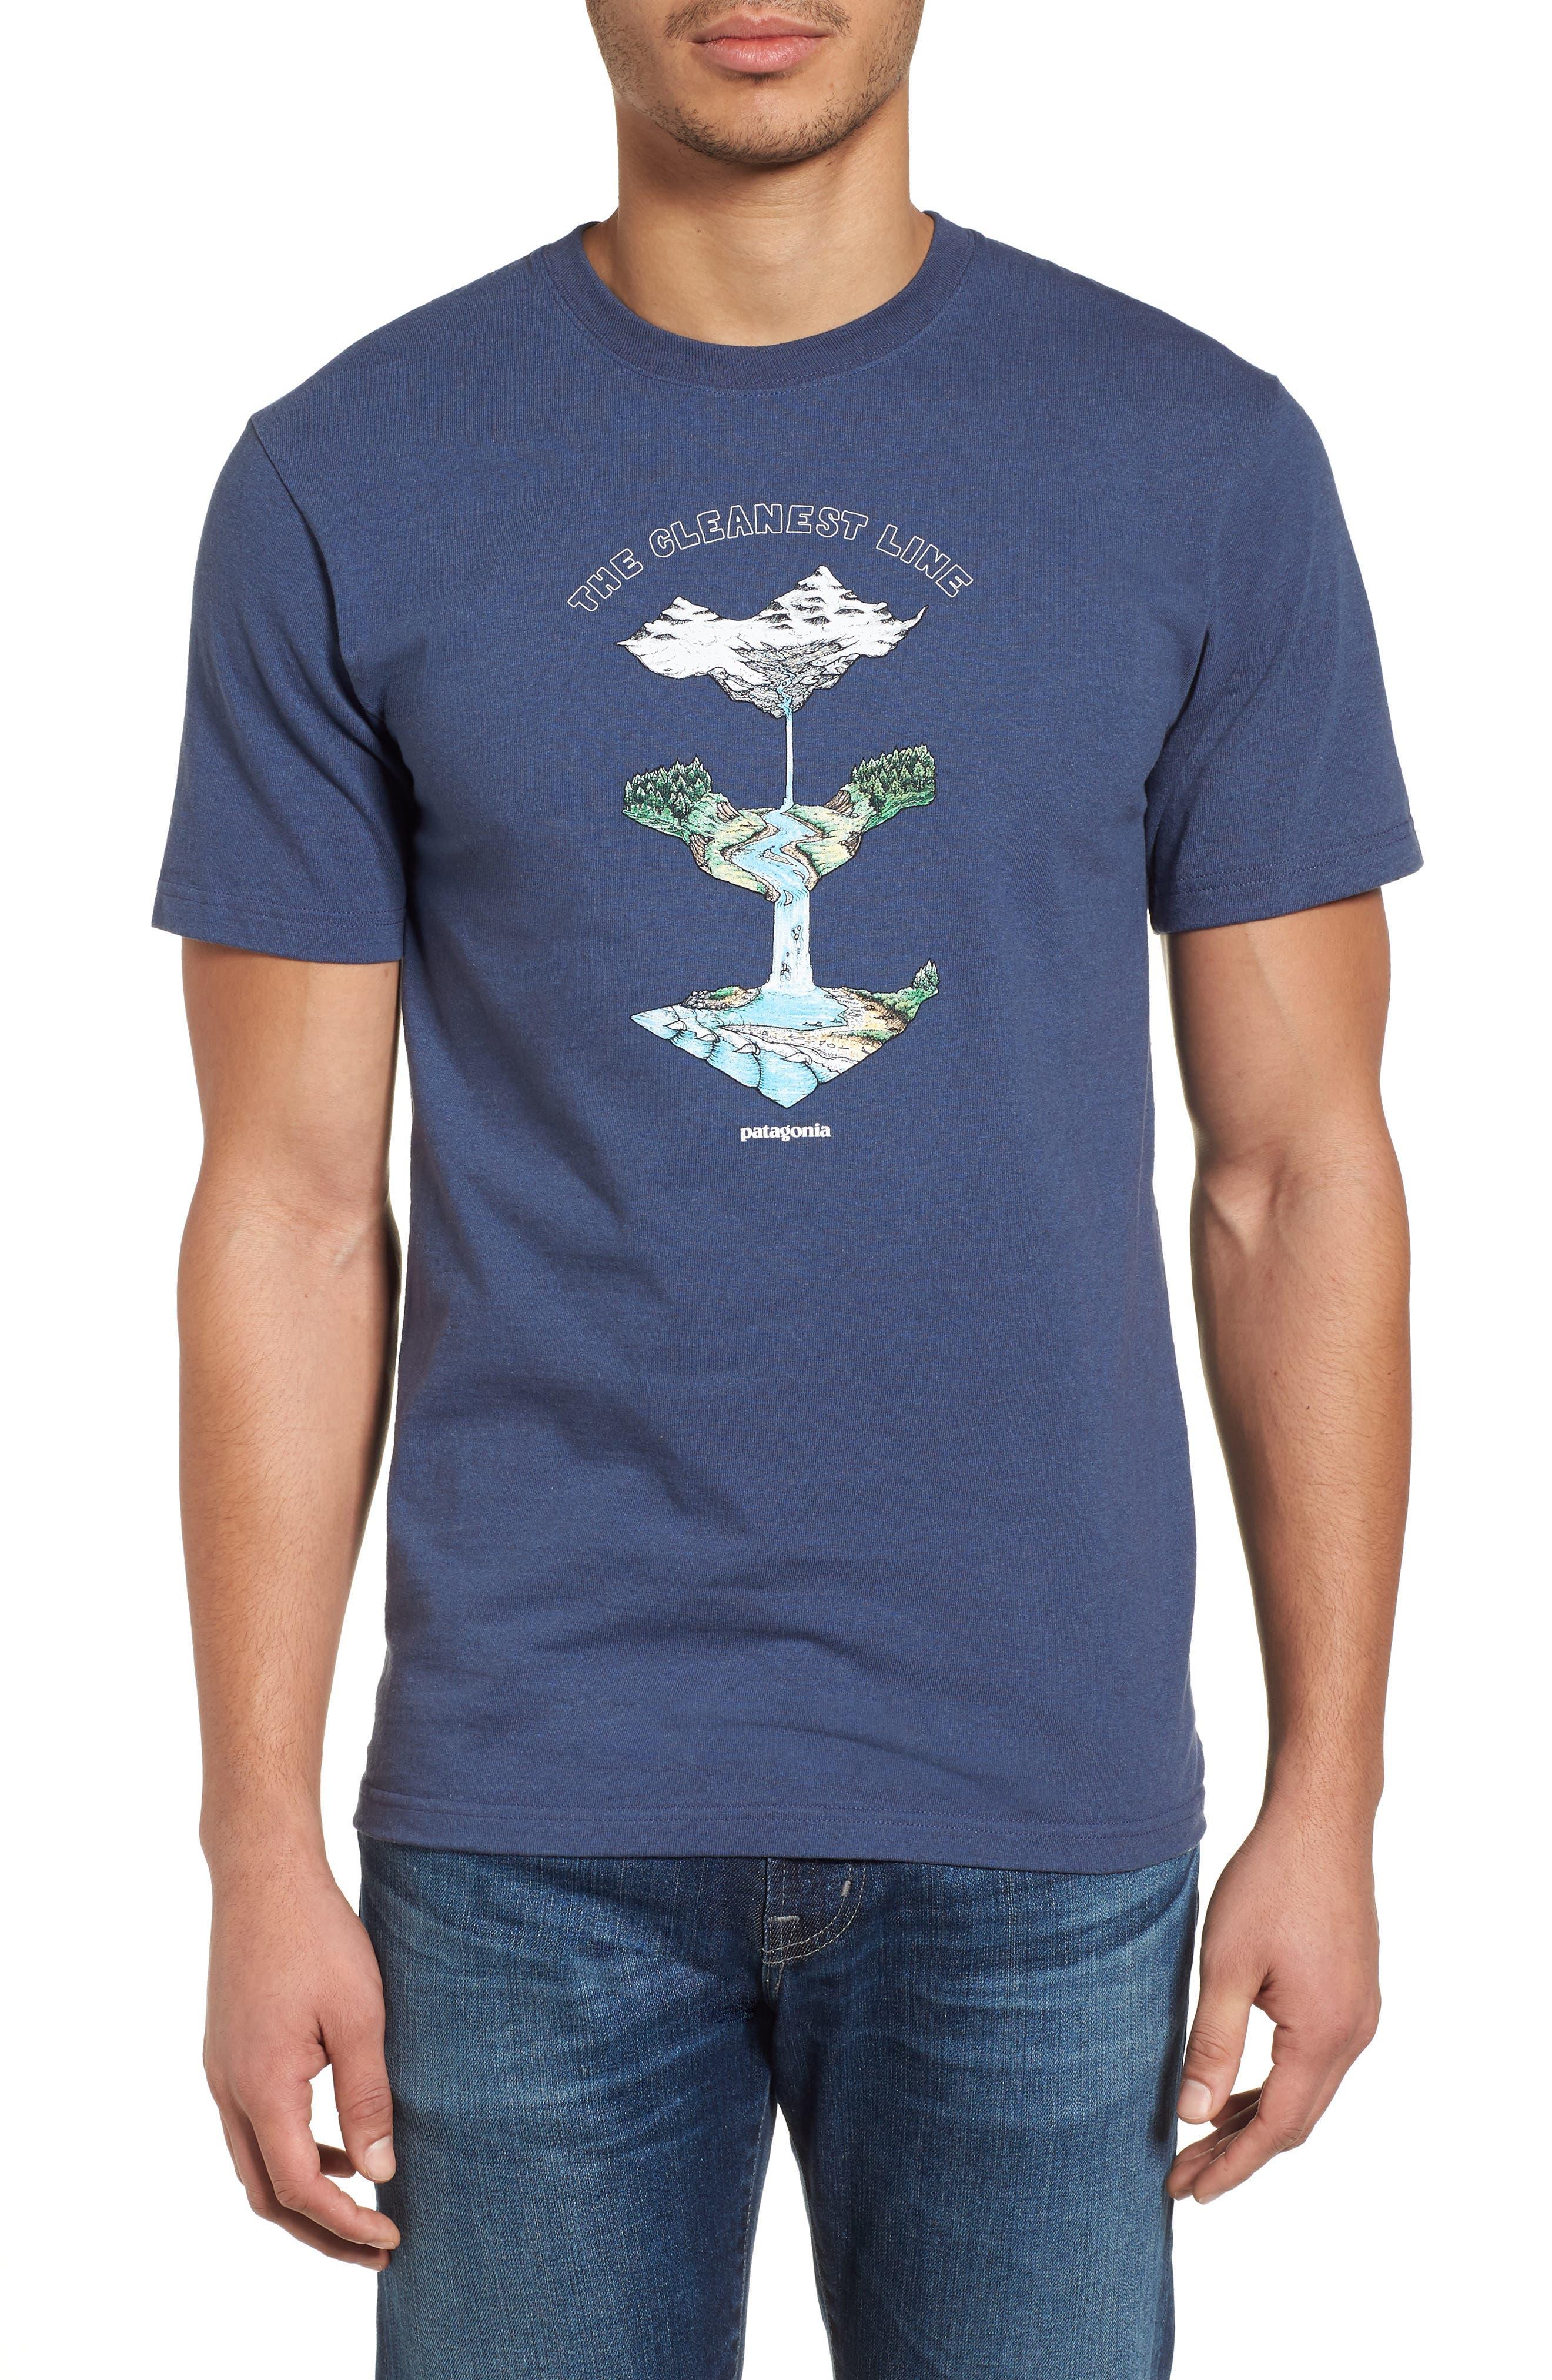 Patagonia Glacier Born Responsibili-Tee T-Shirt